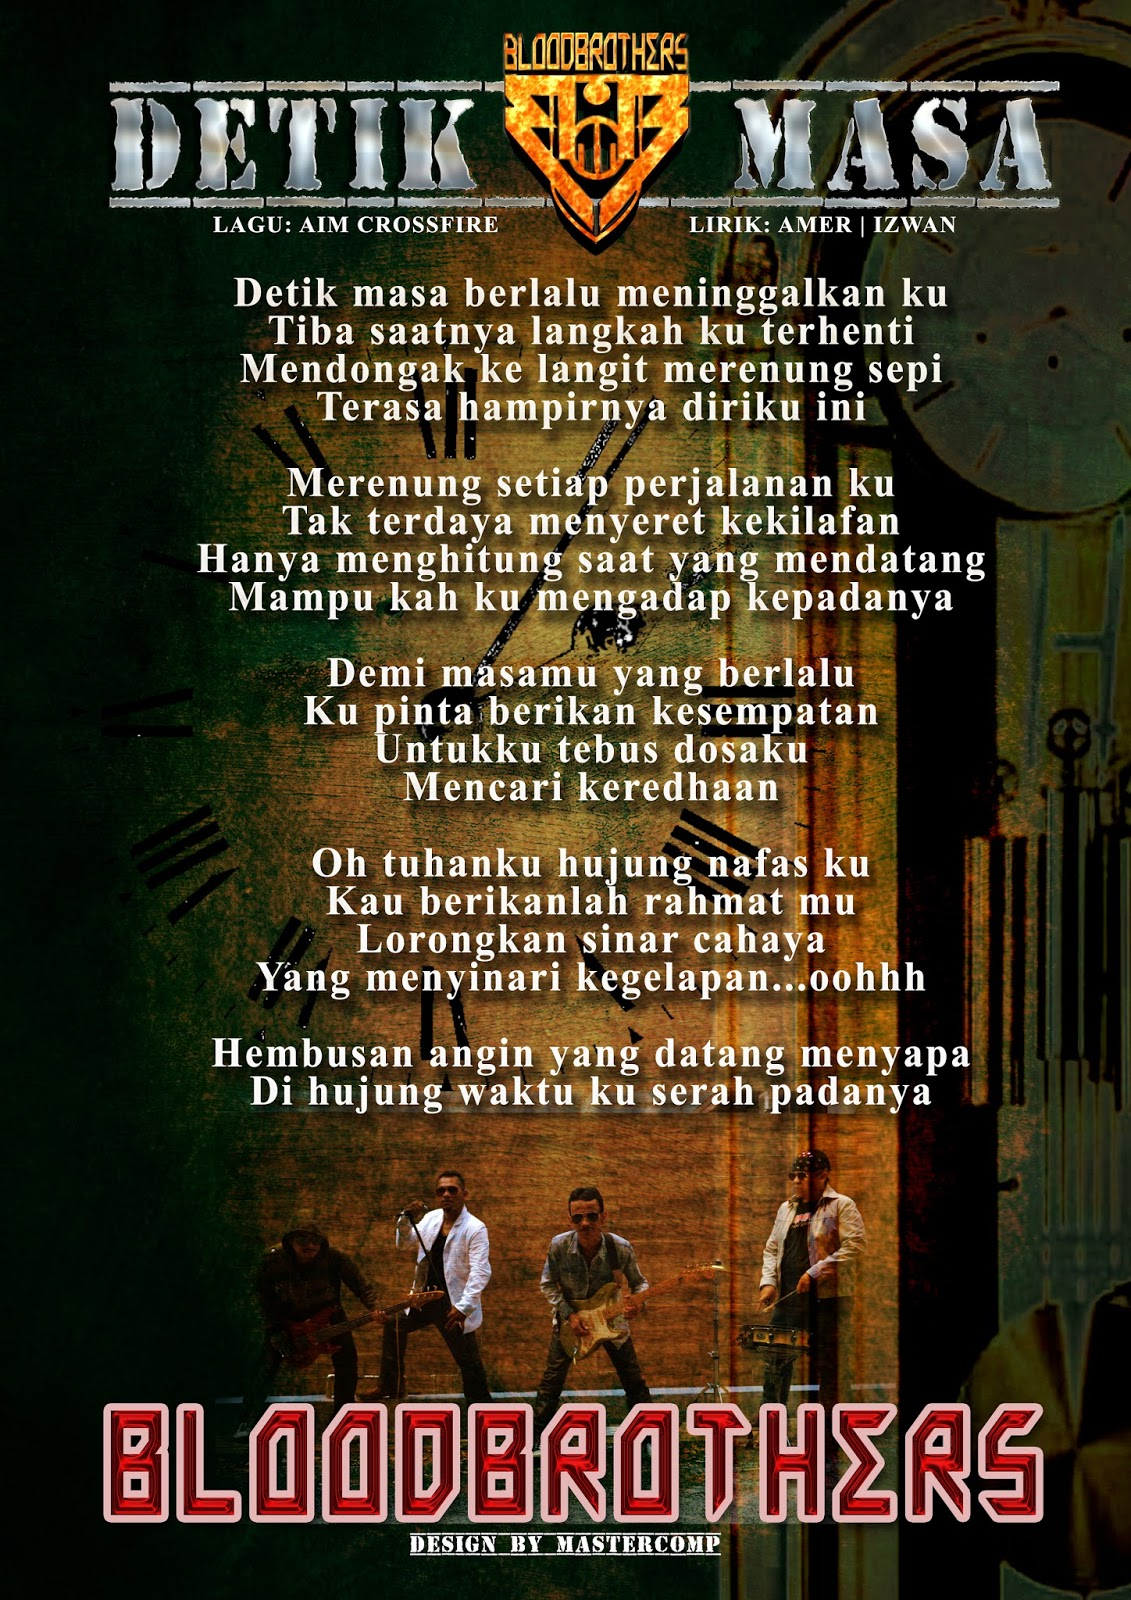 Lirik Bloodbrothers - Detik Masa